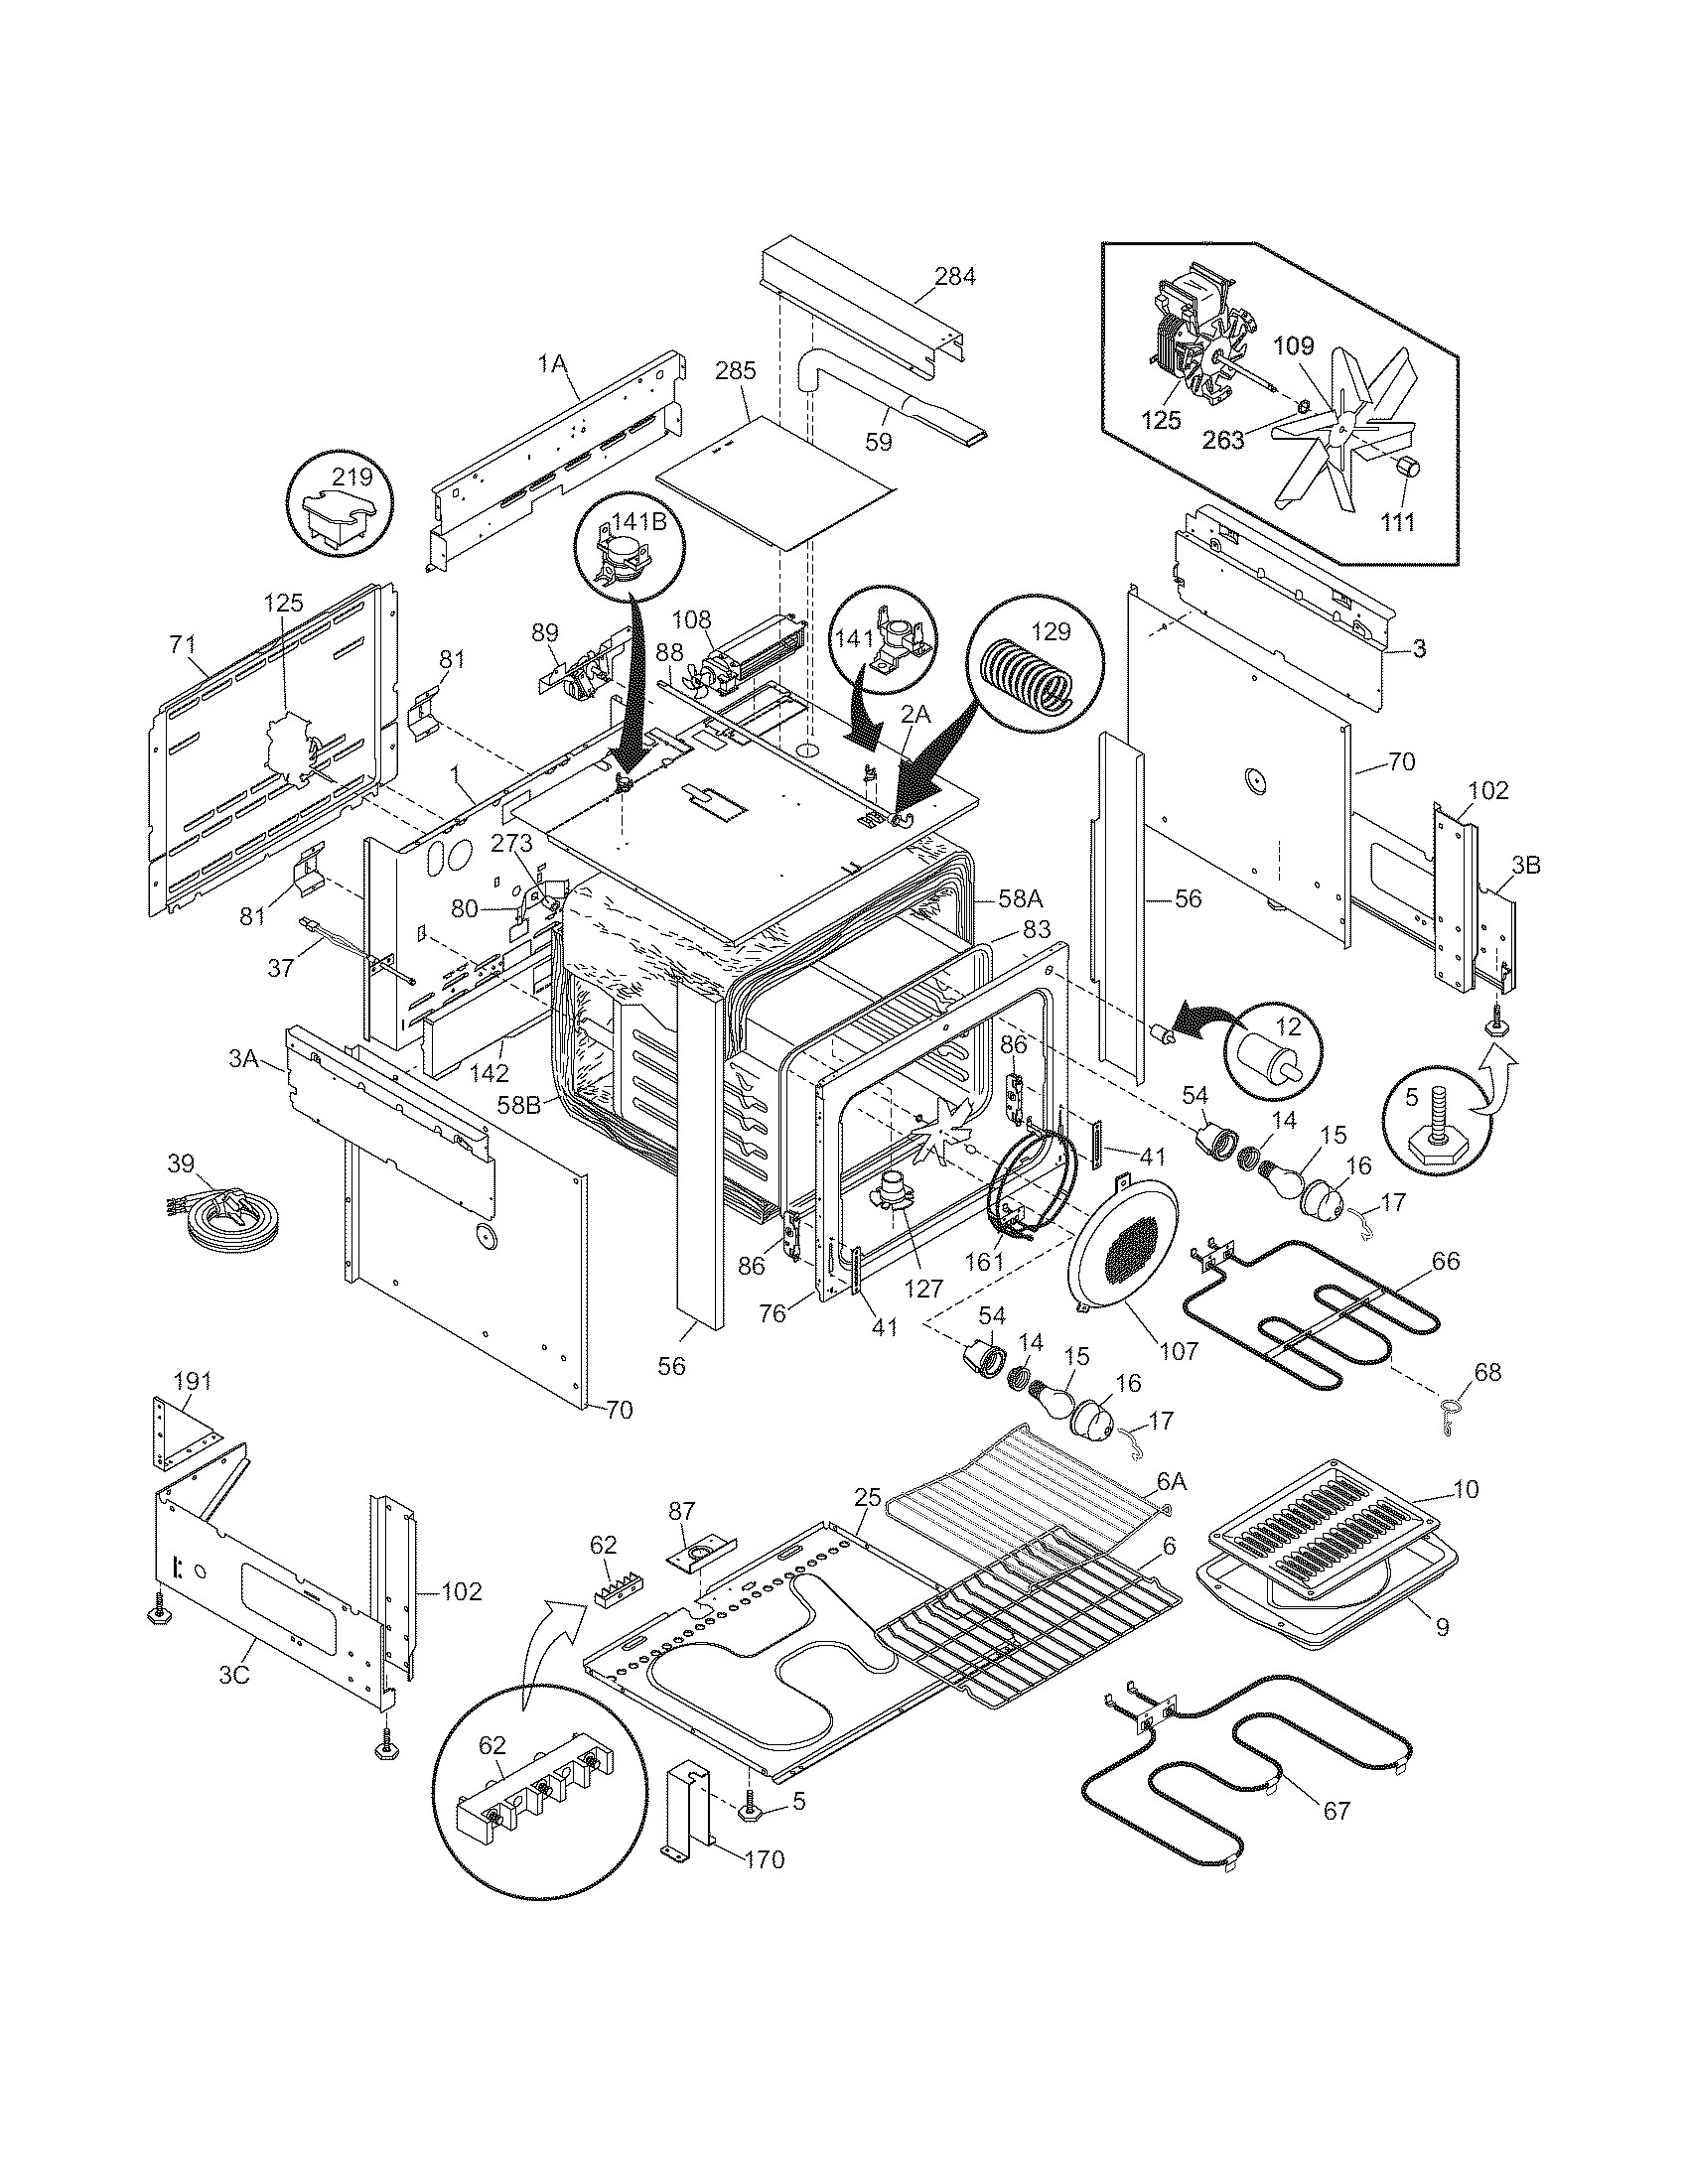 Hobart Mixer Wiring Diagram Hobart A200 Mixer Hobart